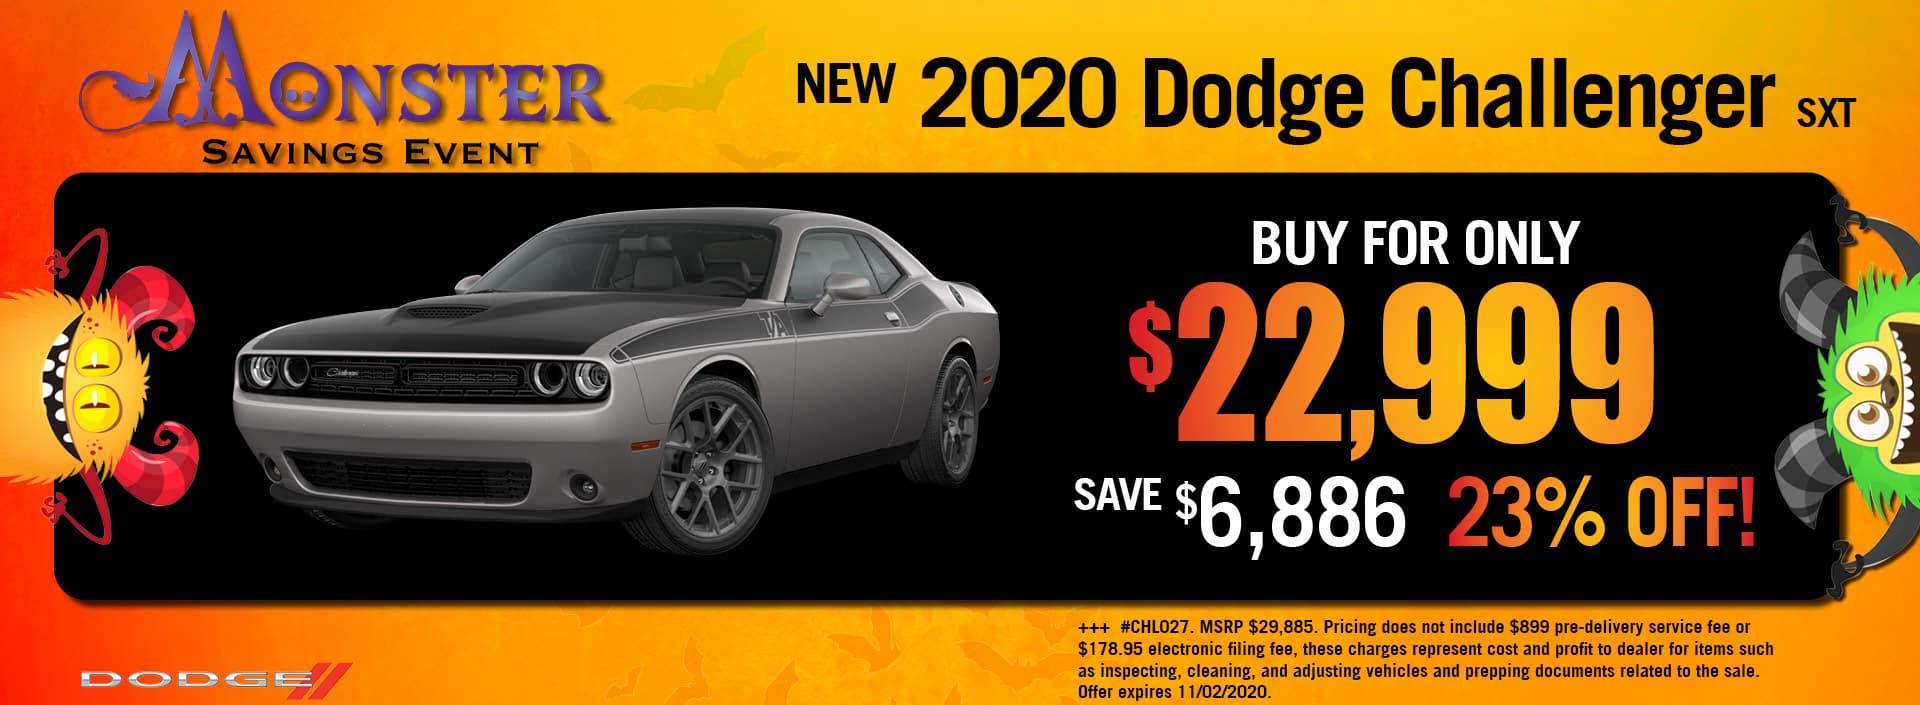 2020 Challenger-22999